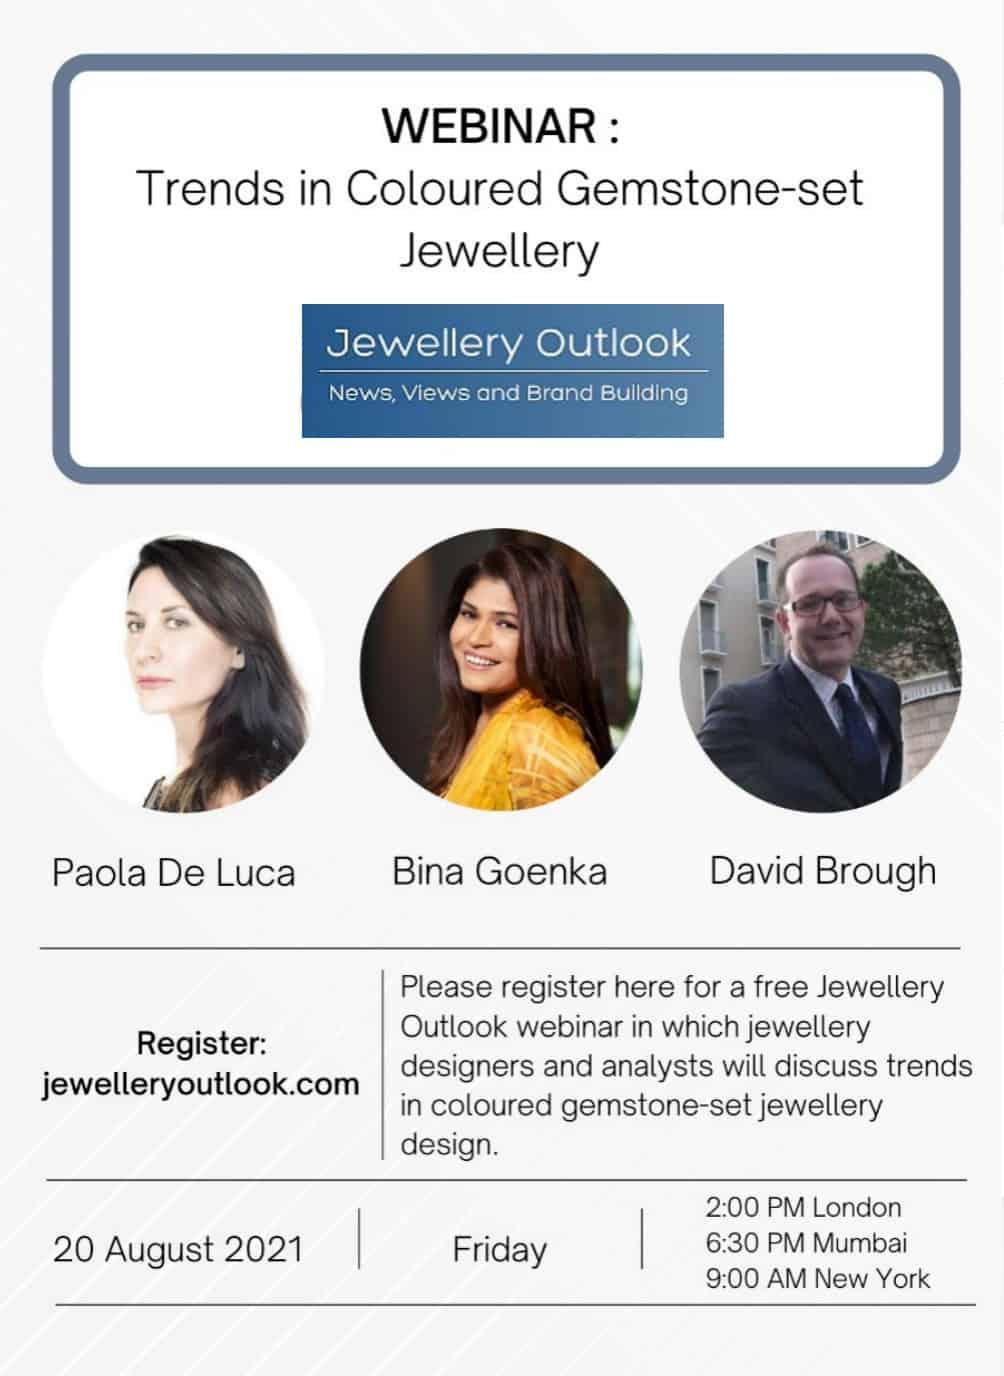 WEBINAR REPLAY – Emerging trends in coloured gemstone-set jewellery design